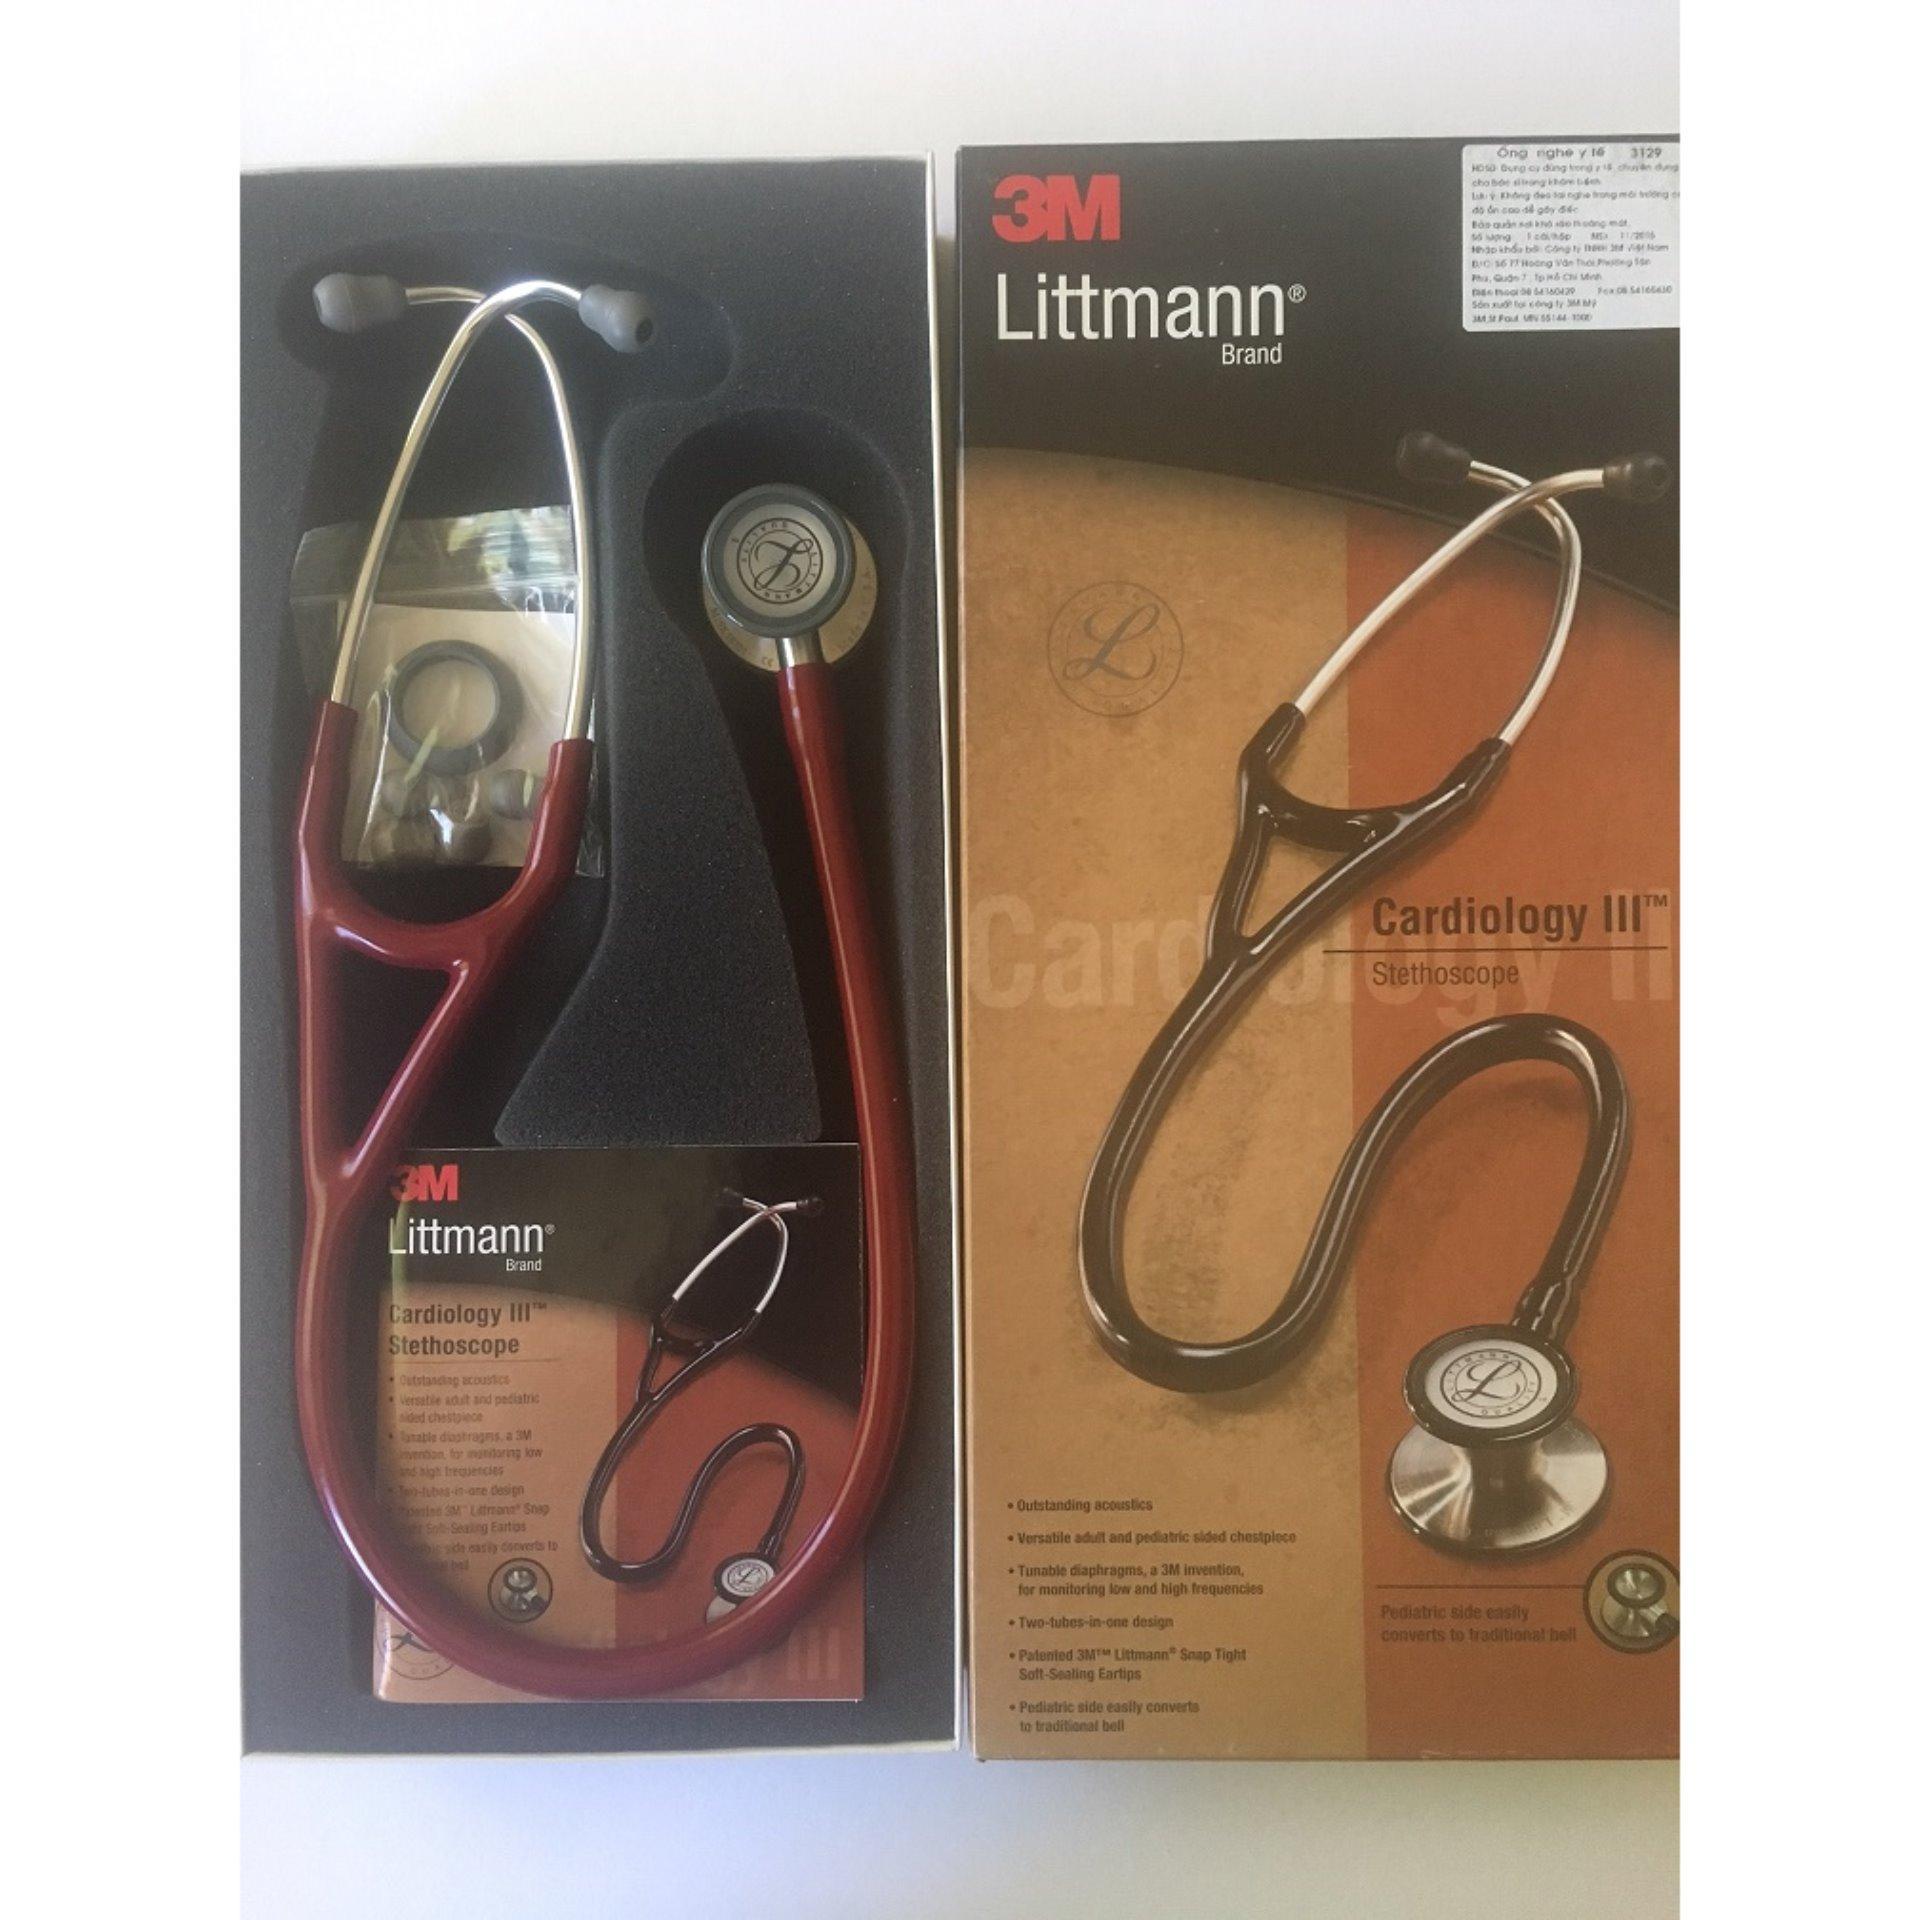 3M Littman Cardiology III Stethoscope Burgundy 27